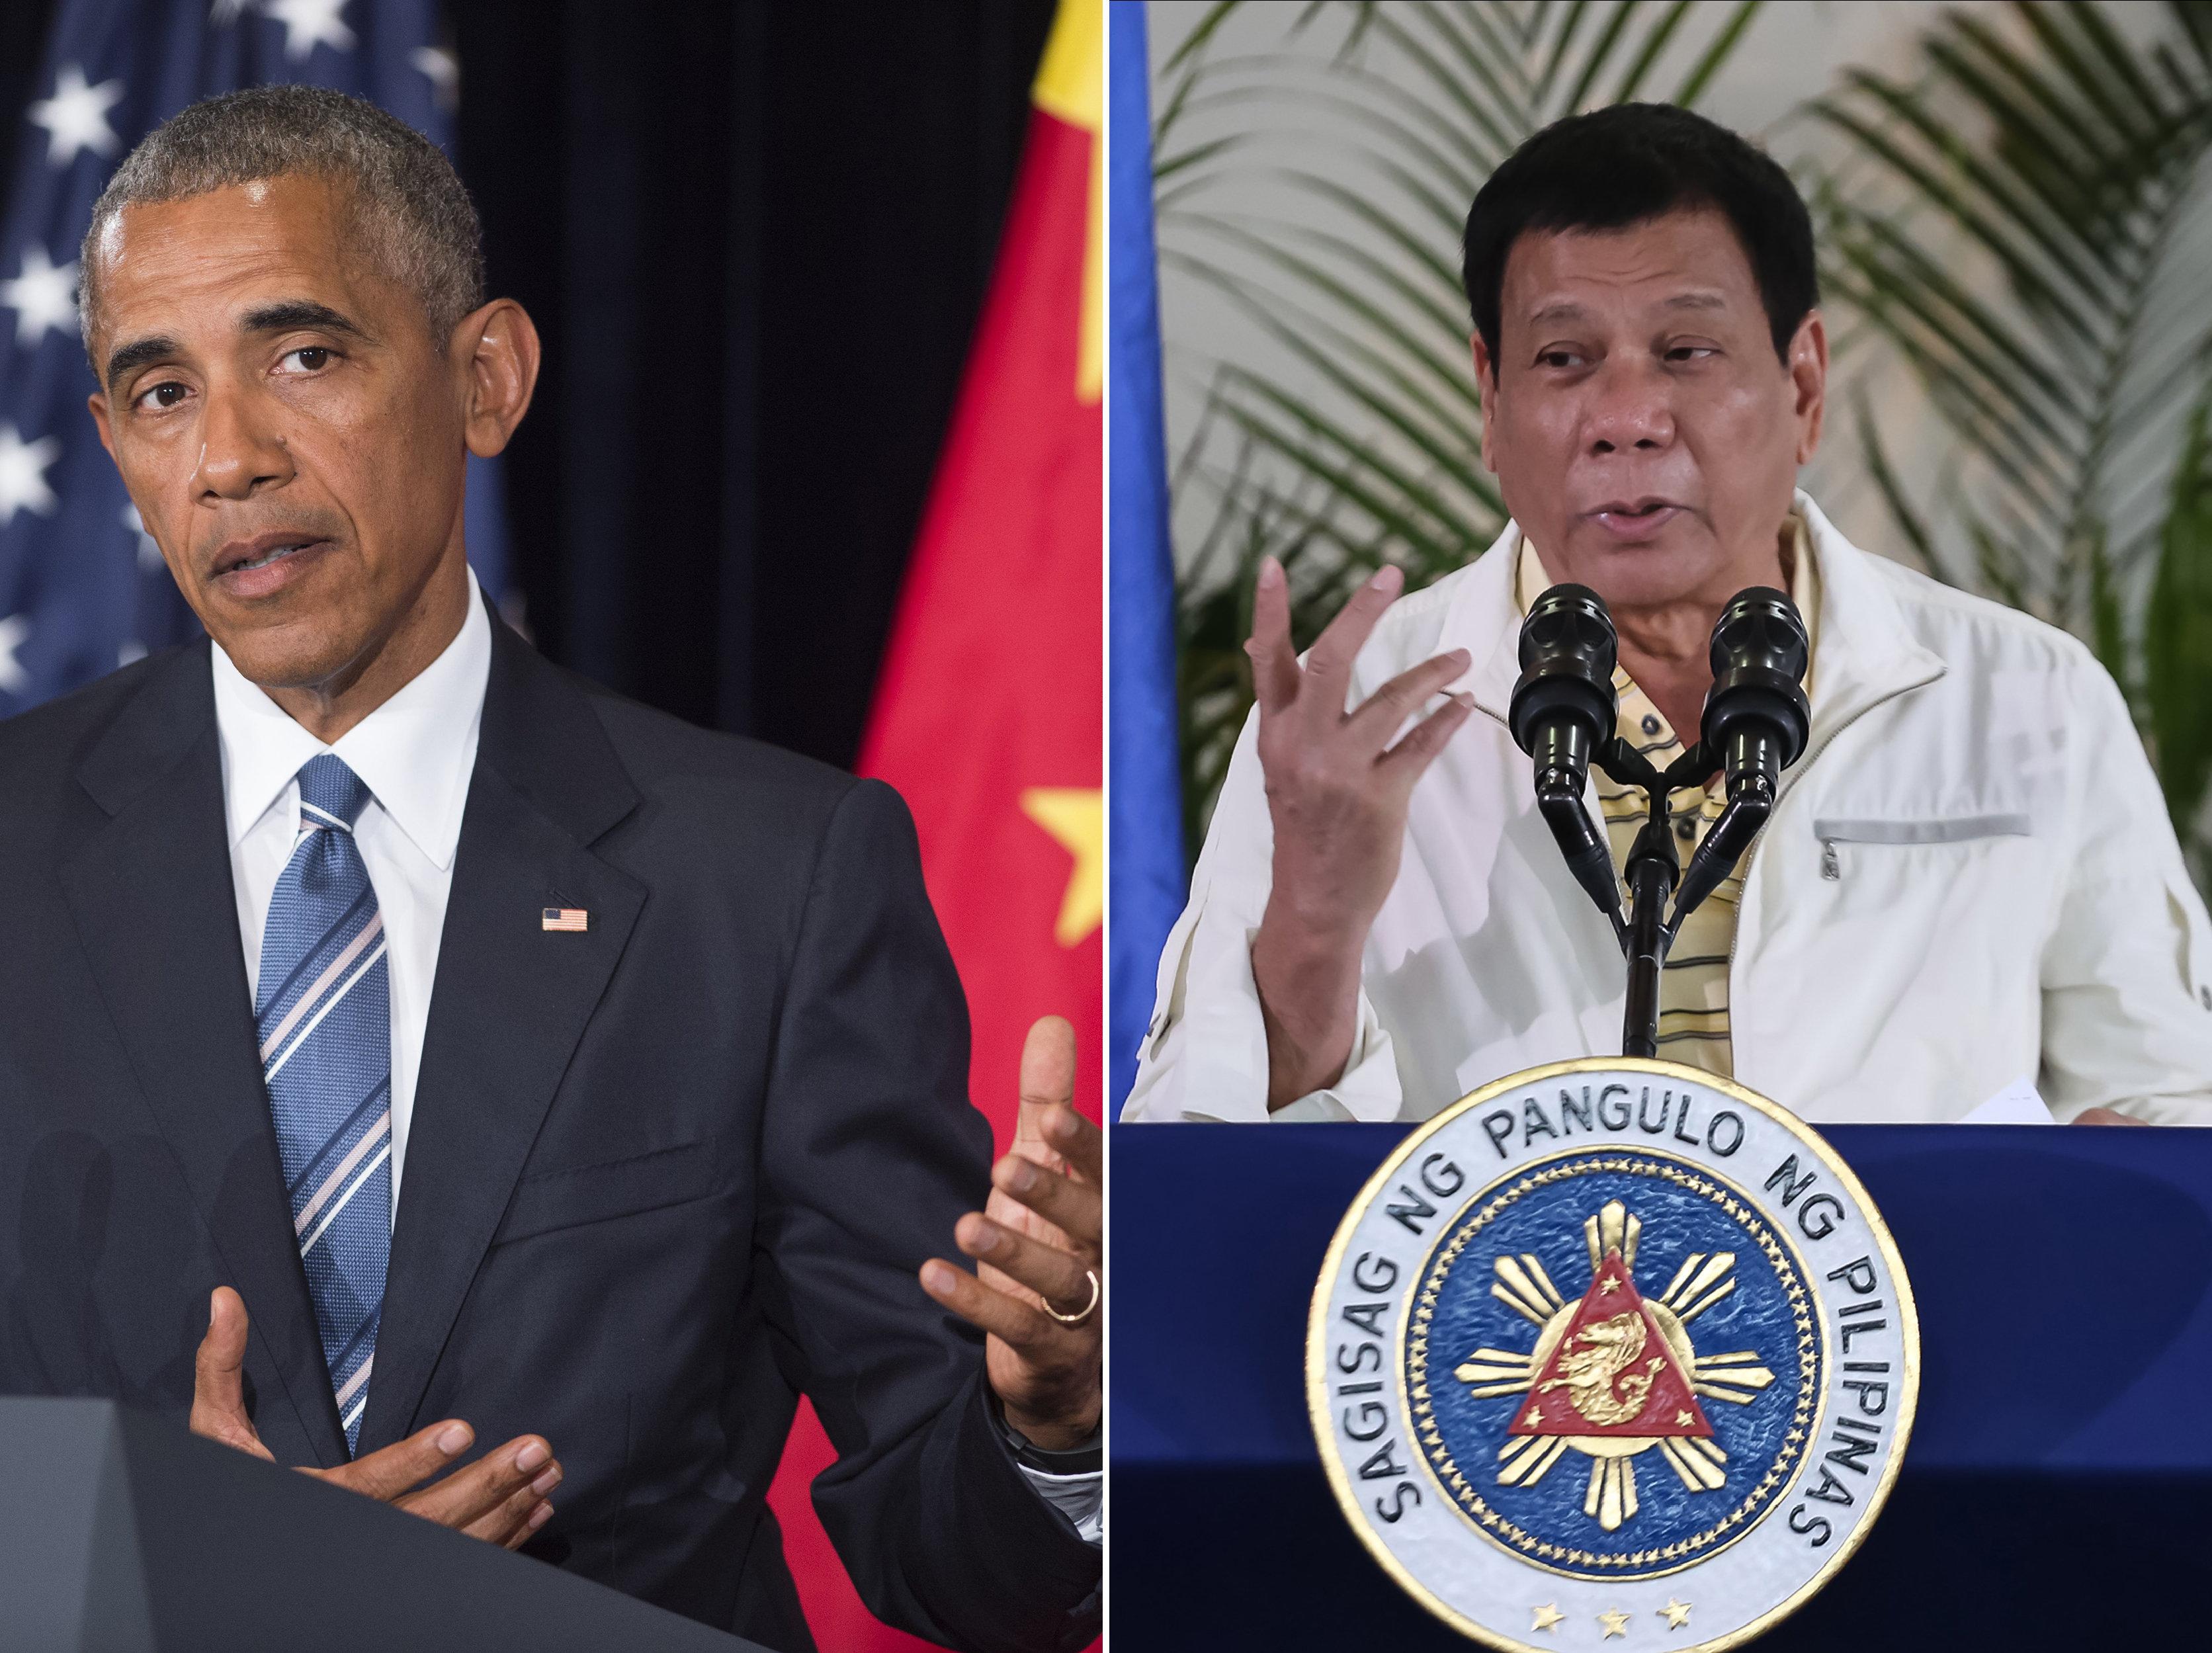 Presidente de EEUU, Barack Obama, y su homólogo filipino, Rodrigo Duterte